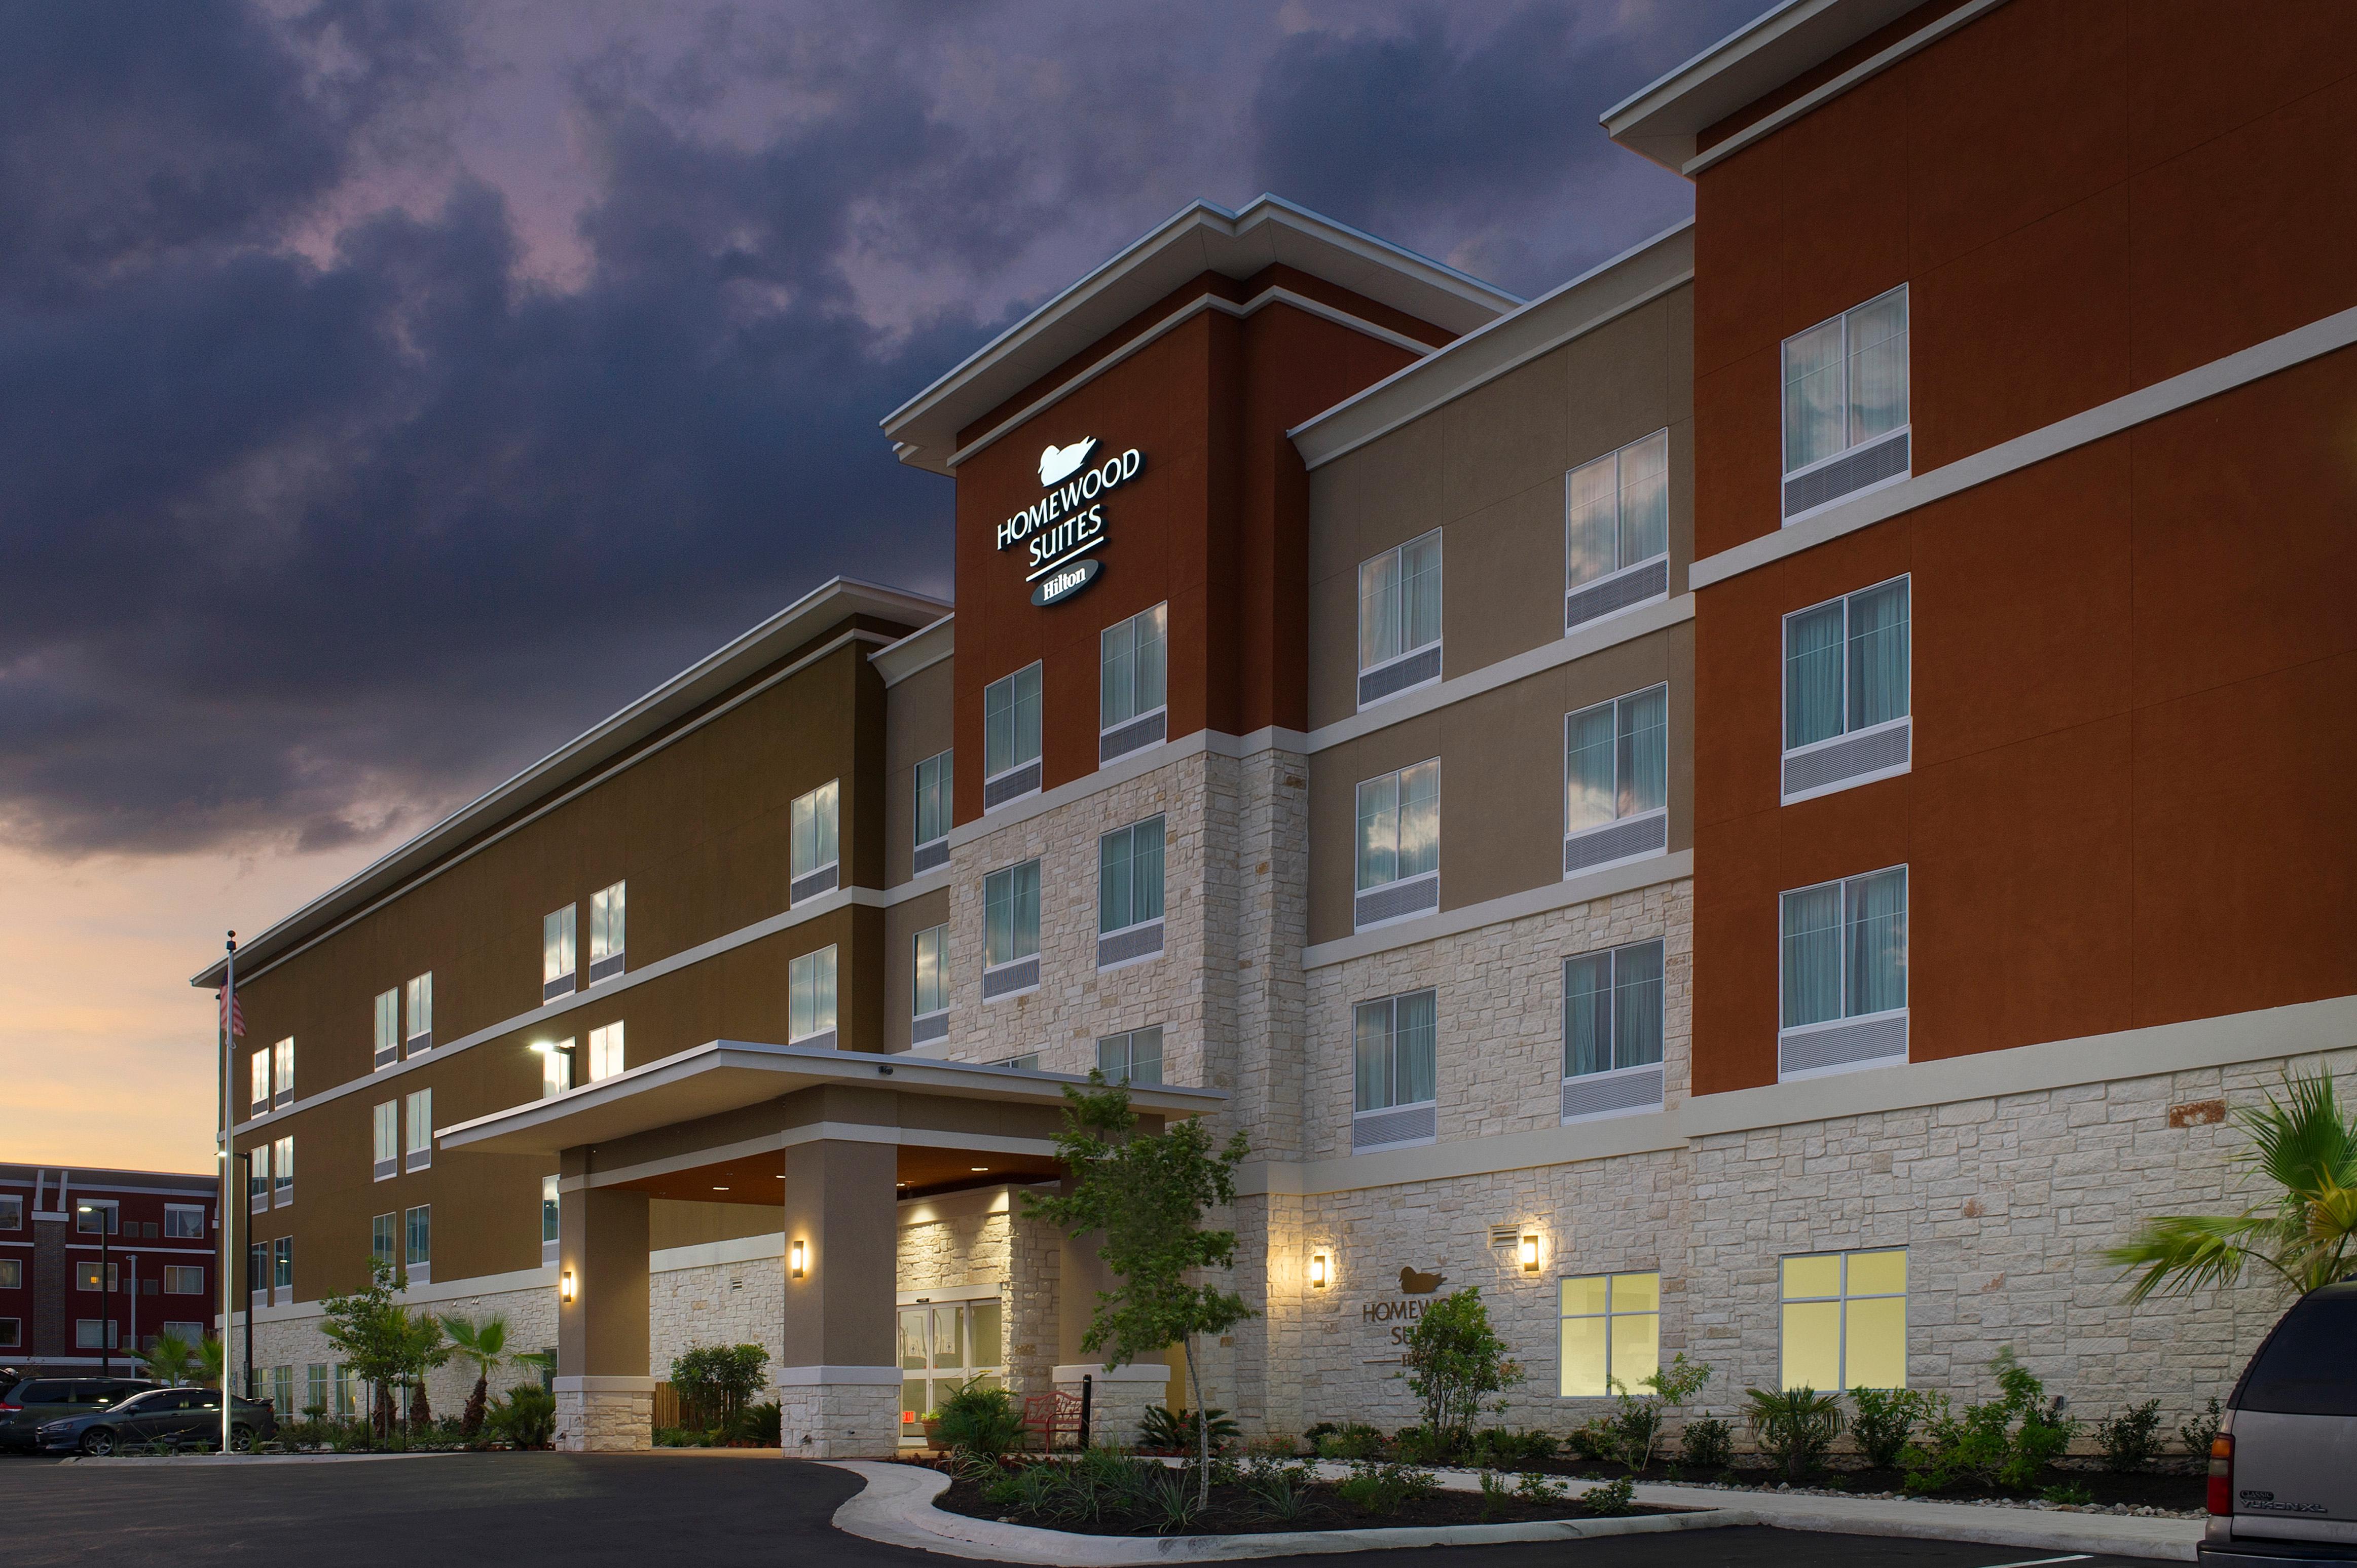 Homewood Suites By Hilton San Antonio Airport San Antonio Texas